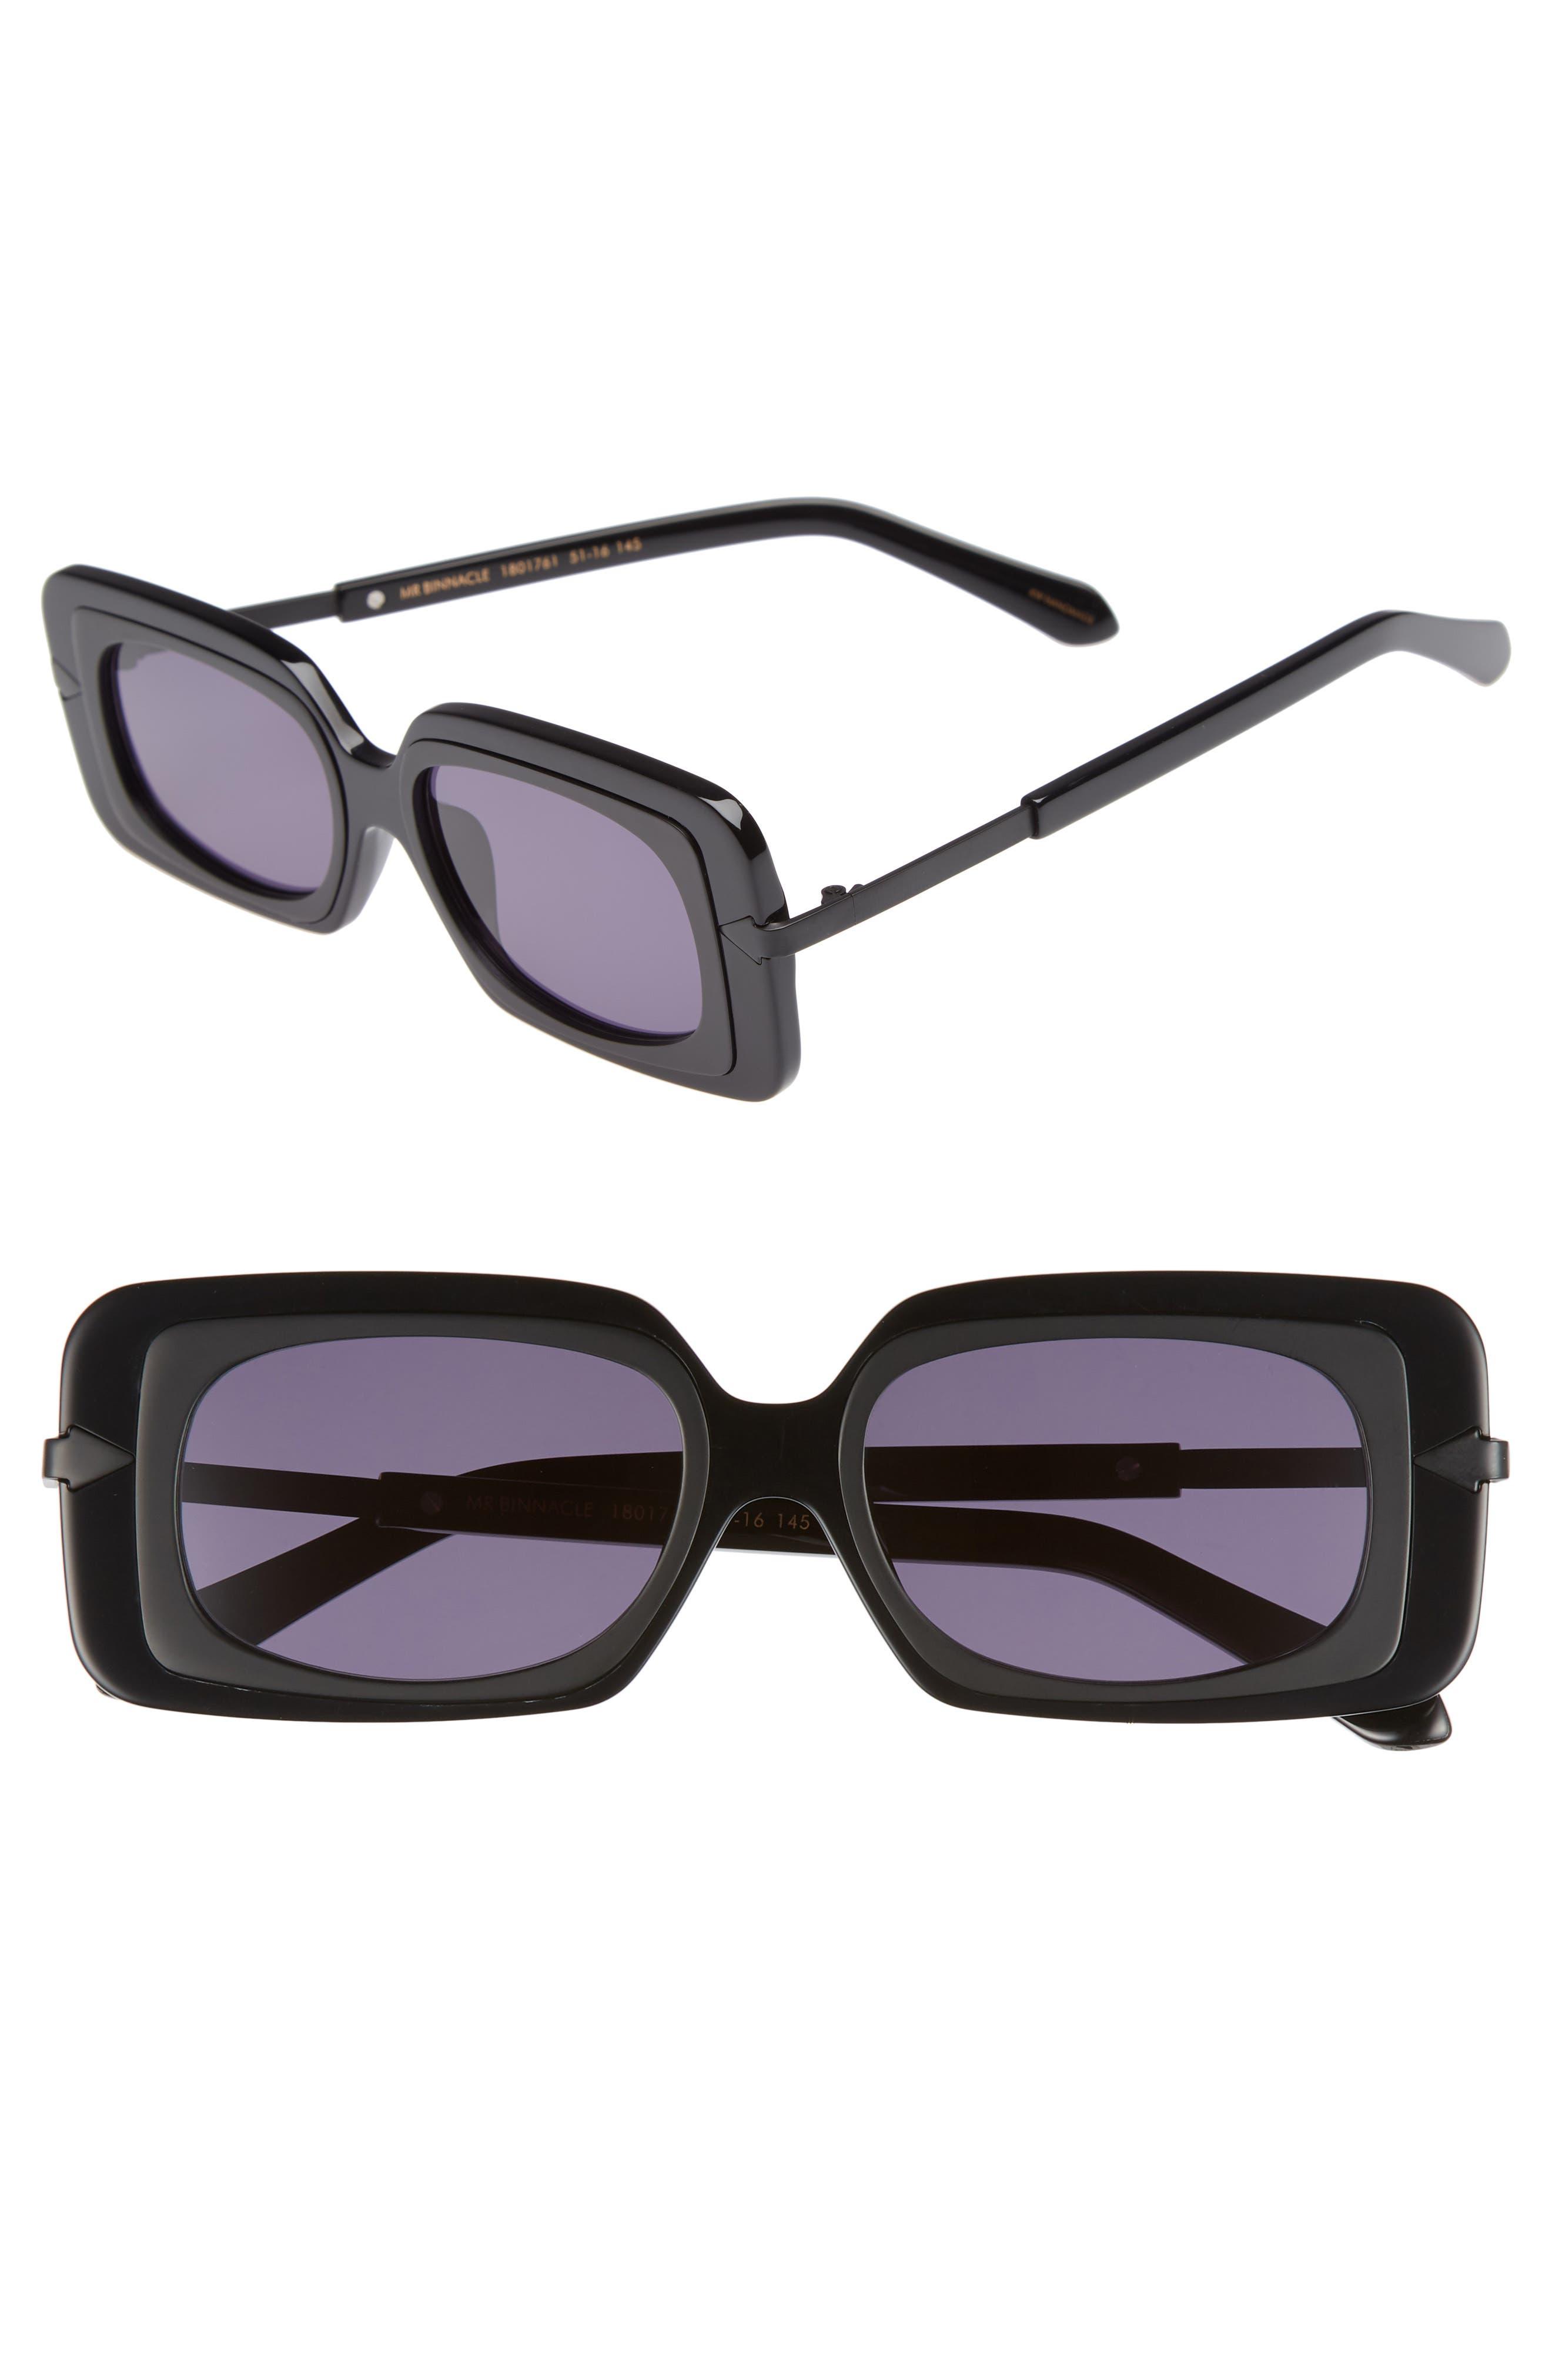 Karen Walker Mr. Binnacle 51mm Sunglasses